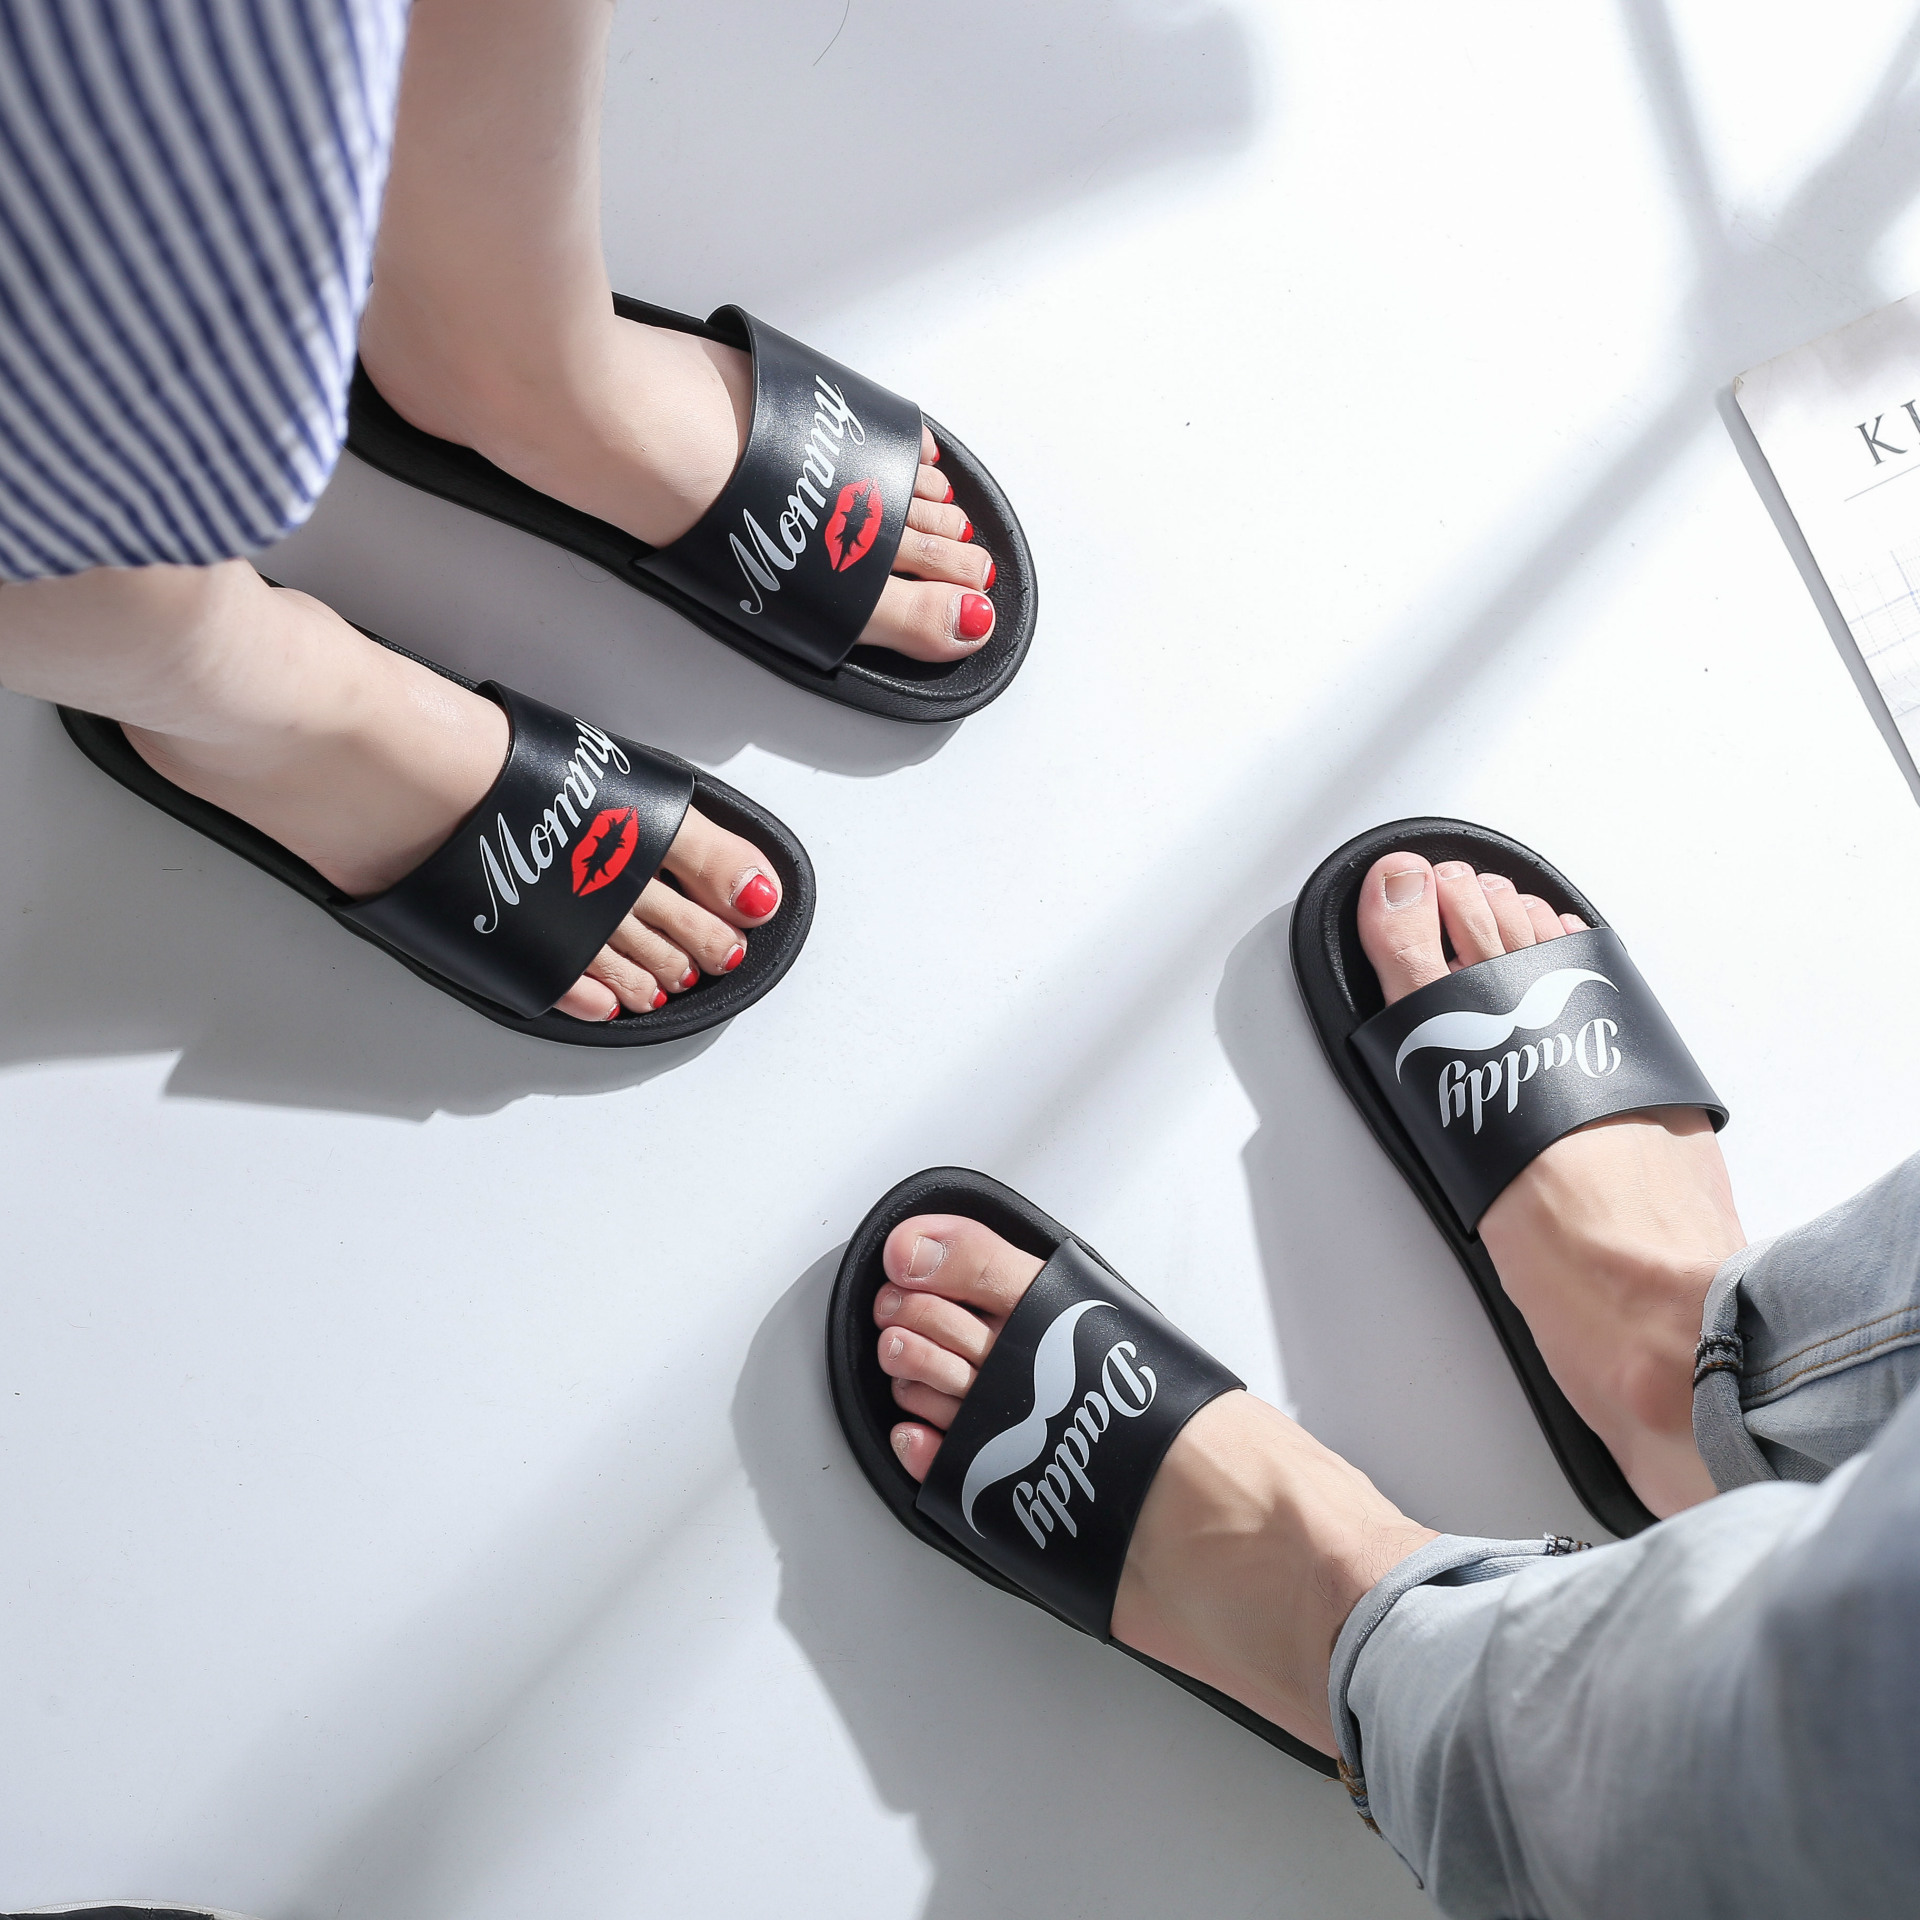 69440dfe660fc4 Women Summer Slides Flamingo Cartoon Lovely Beach Slippers Platform Sandals  Women Shoes Flip Flops Zapatillas Mujer Lovers Slide-in Slippers from Shoes  on ...